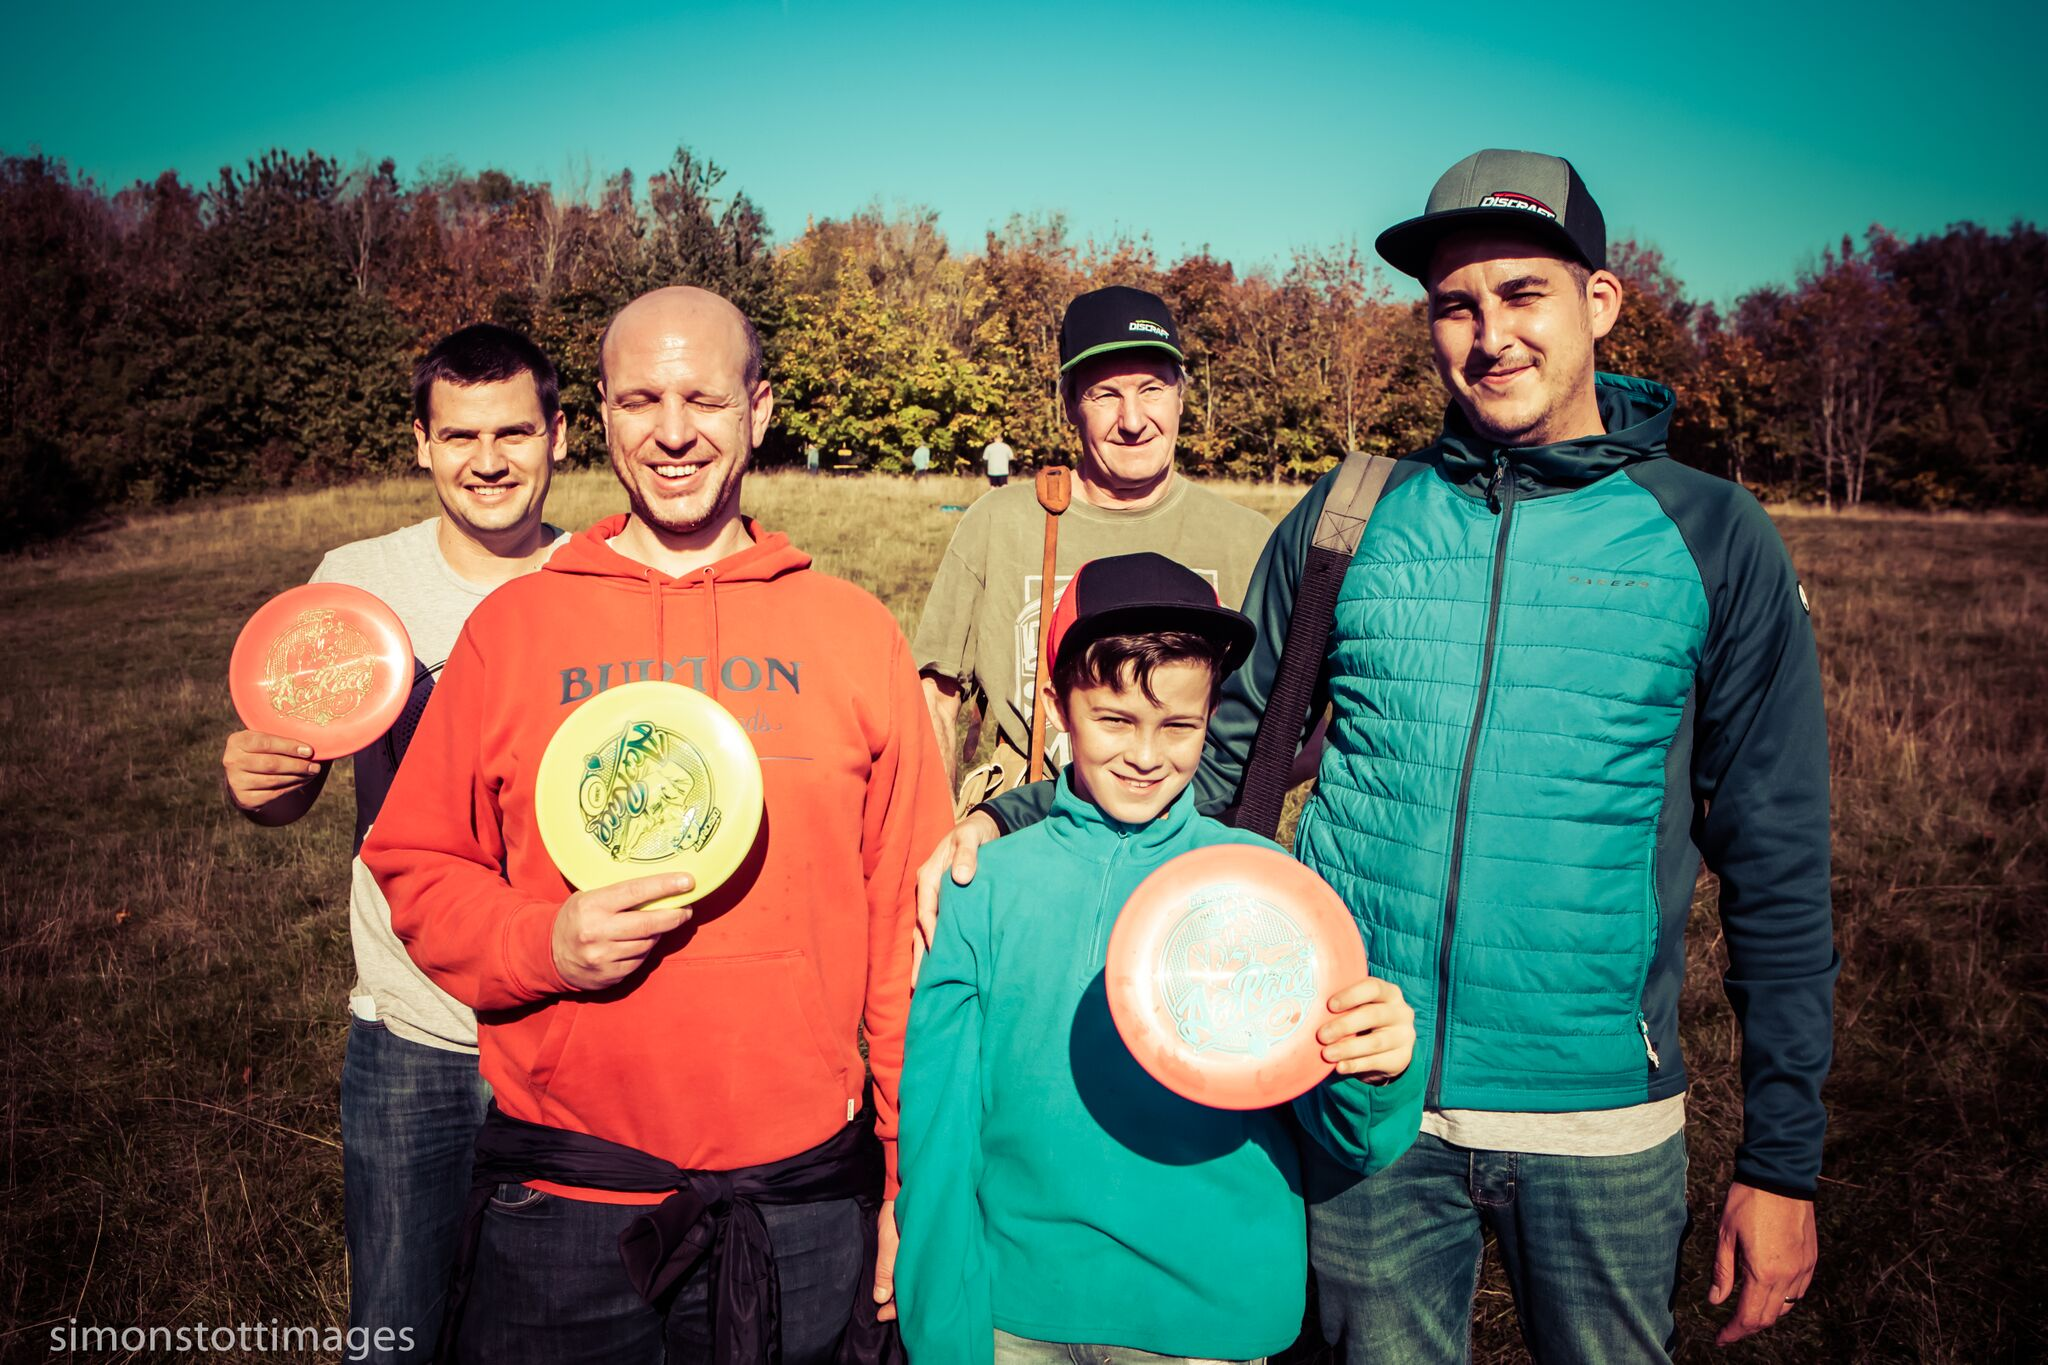 Martin Harris, Geoff Towns, Brian Shaw, Dave Landreth & Finley Landreth at the Brighton Ace Race 2018.